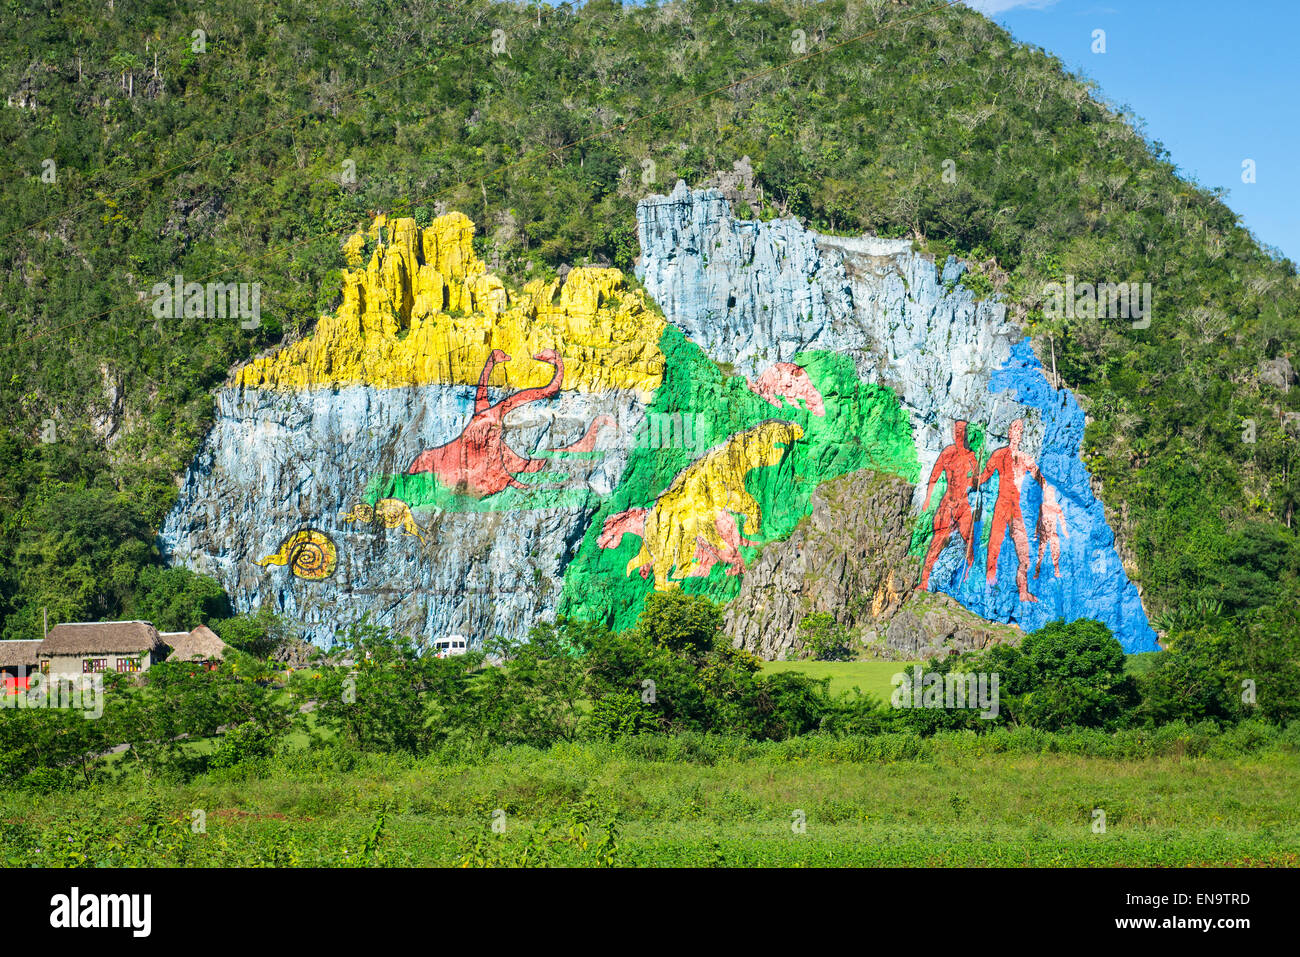 Cuba vinales mural de la prehistoria mogote painting by for Mural de la prehistoria